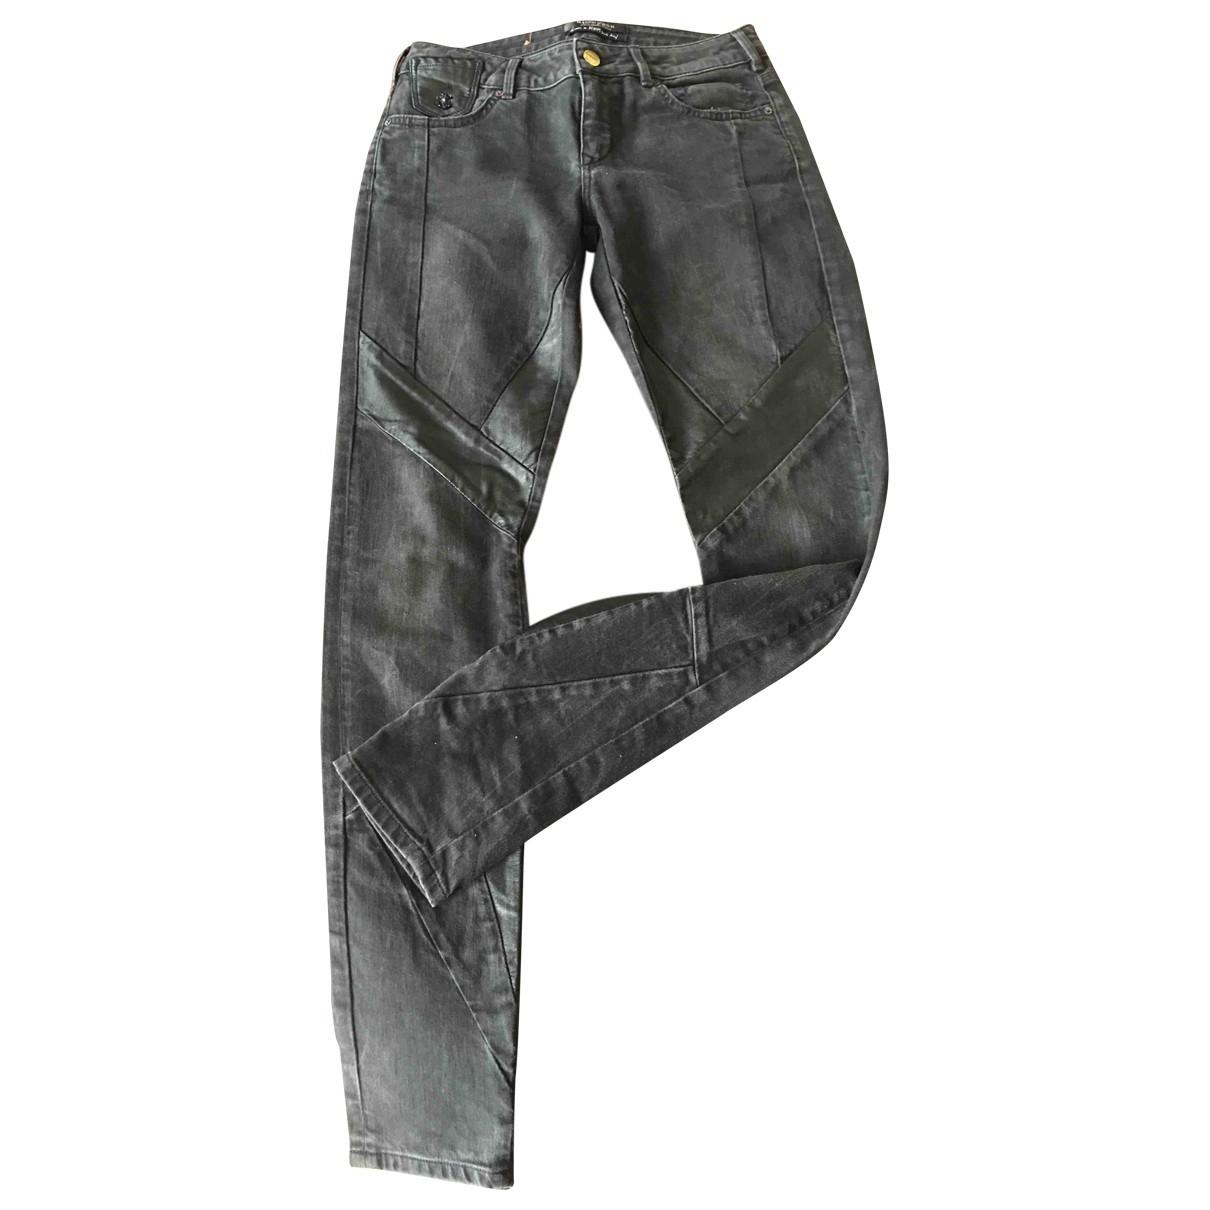 Maison Scotch \N Black Denim - Jeans Trousers for Women One Size International